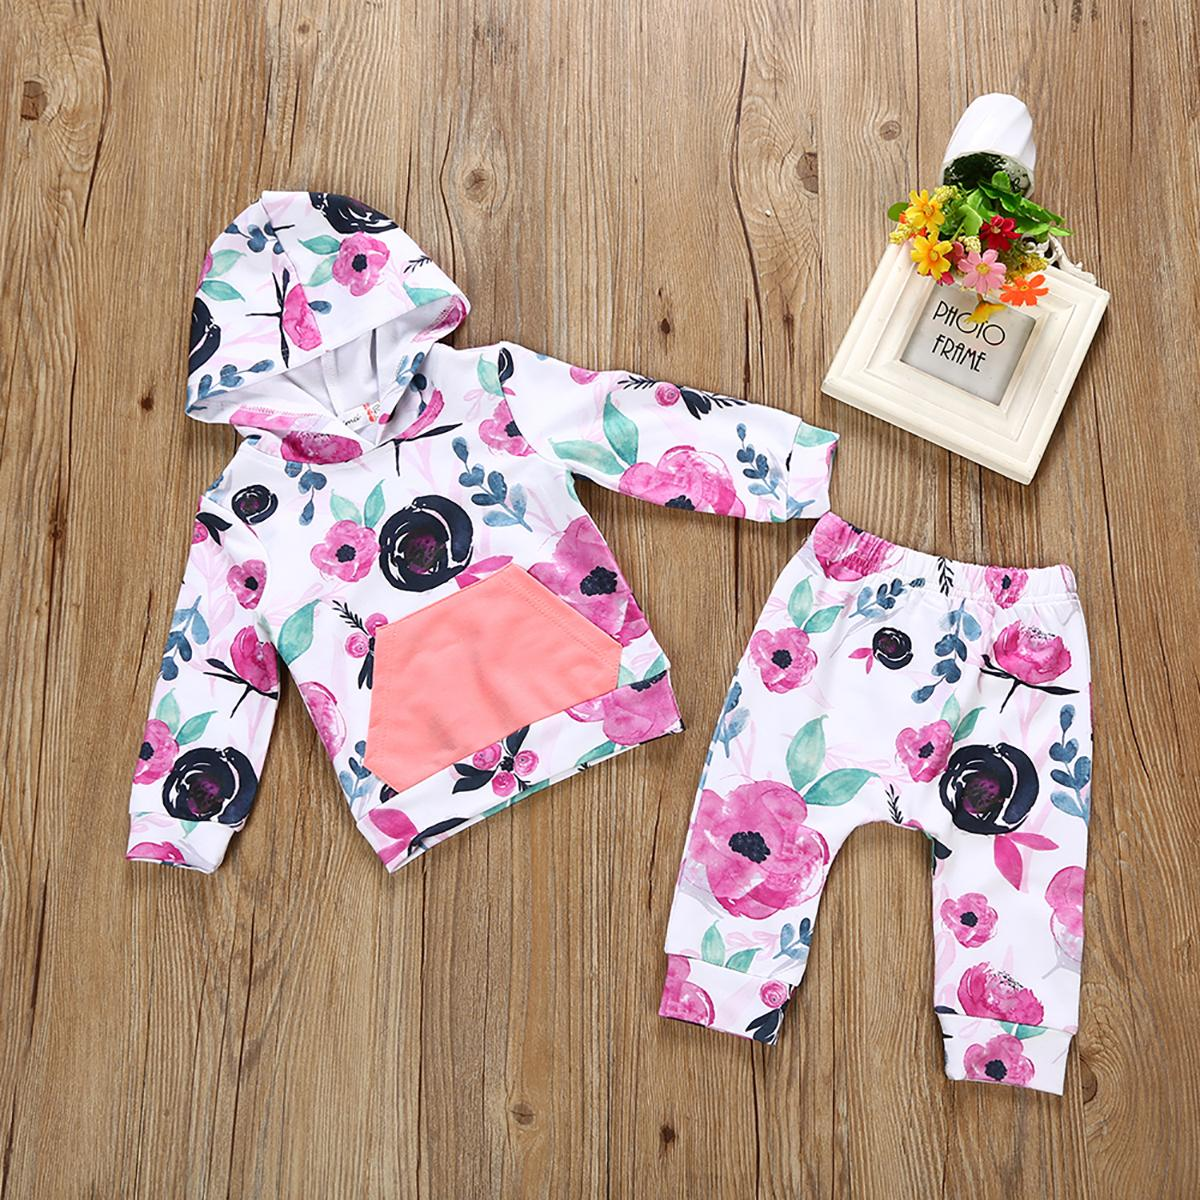 2ST Kleinkind Neugeborenes Baby-Kleidung eines reizendes Baby Baby mit Kapuze T-Shirt Tops + Long Pants Outfits Kleidung